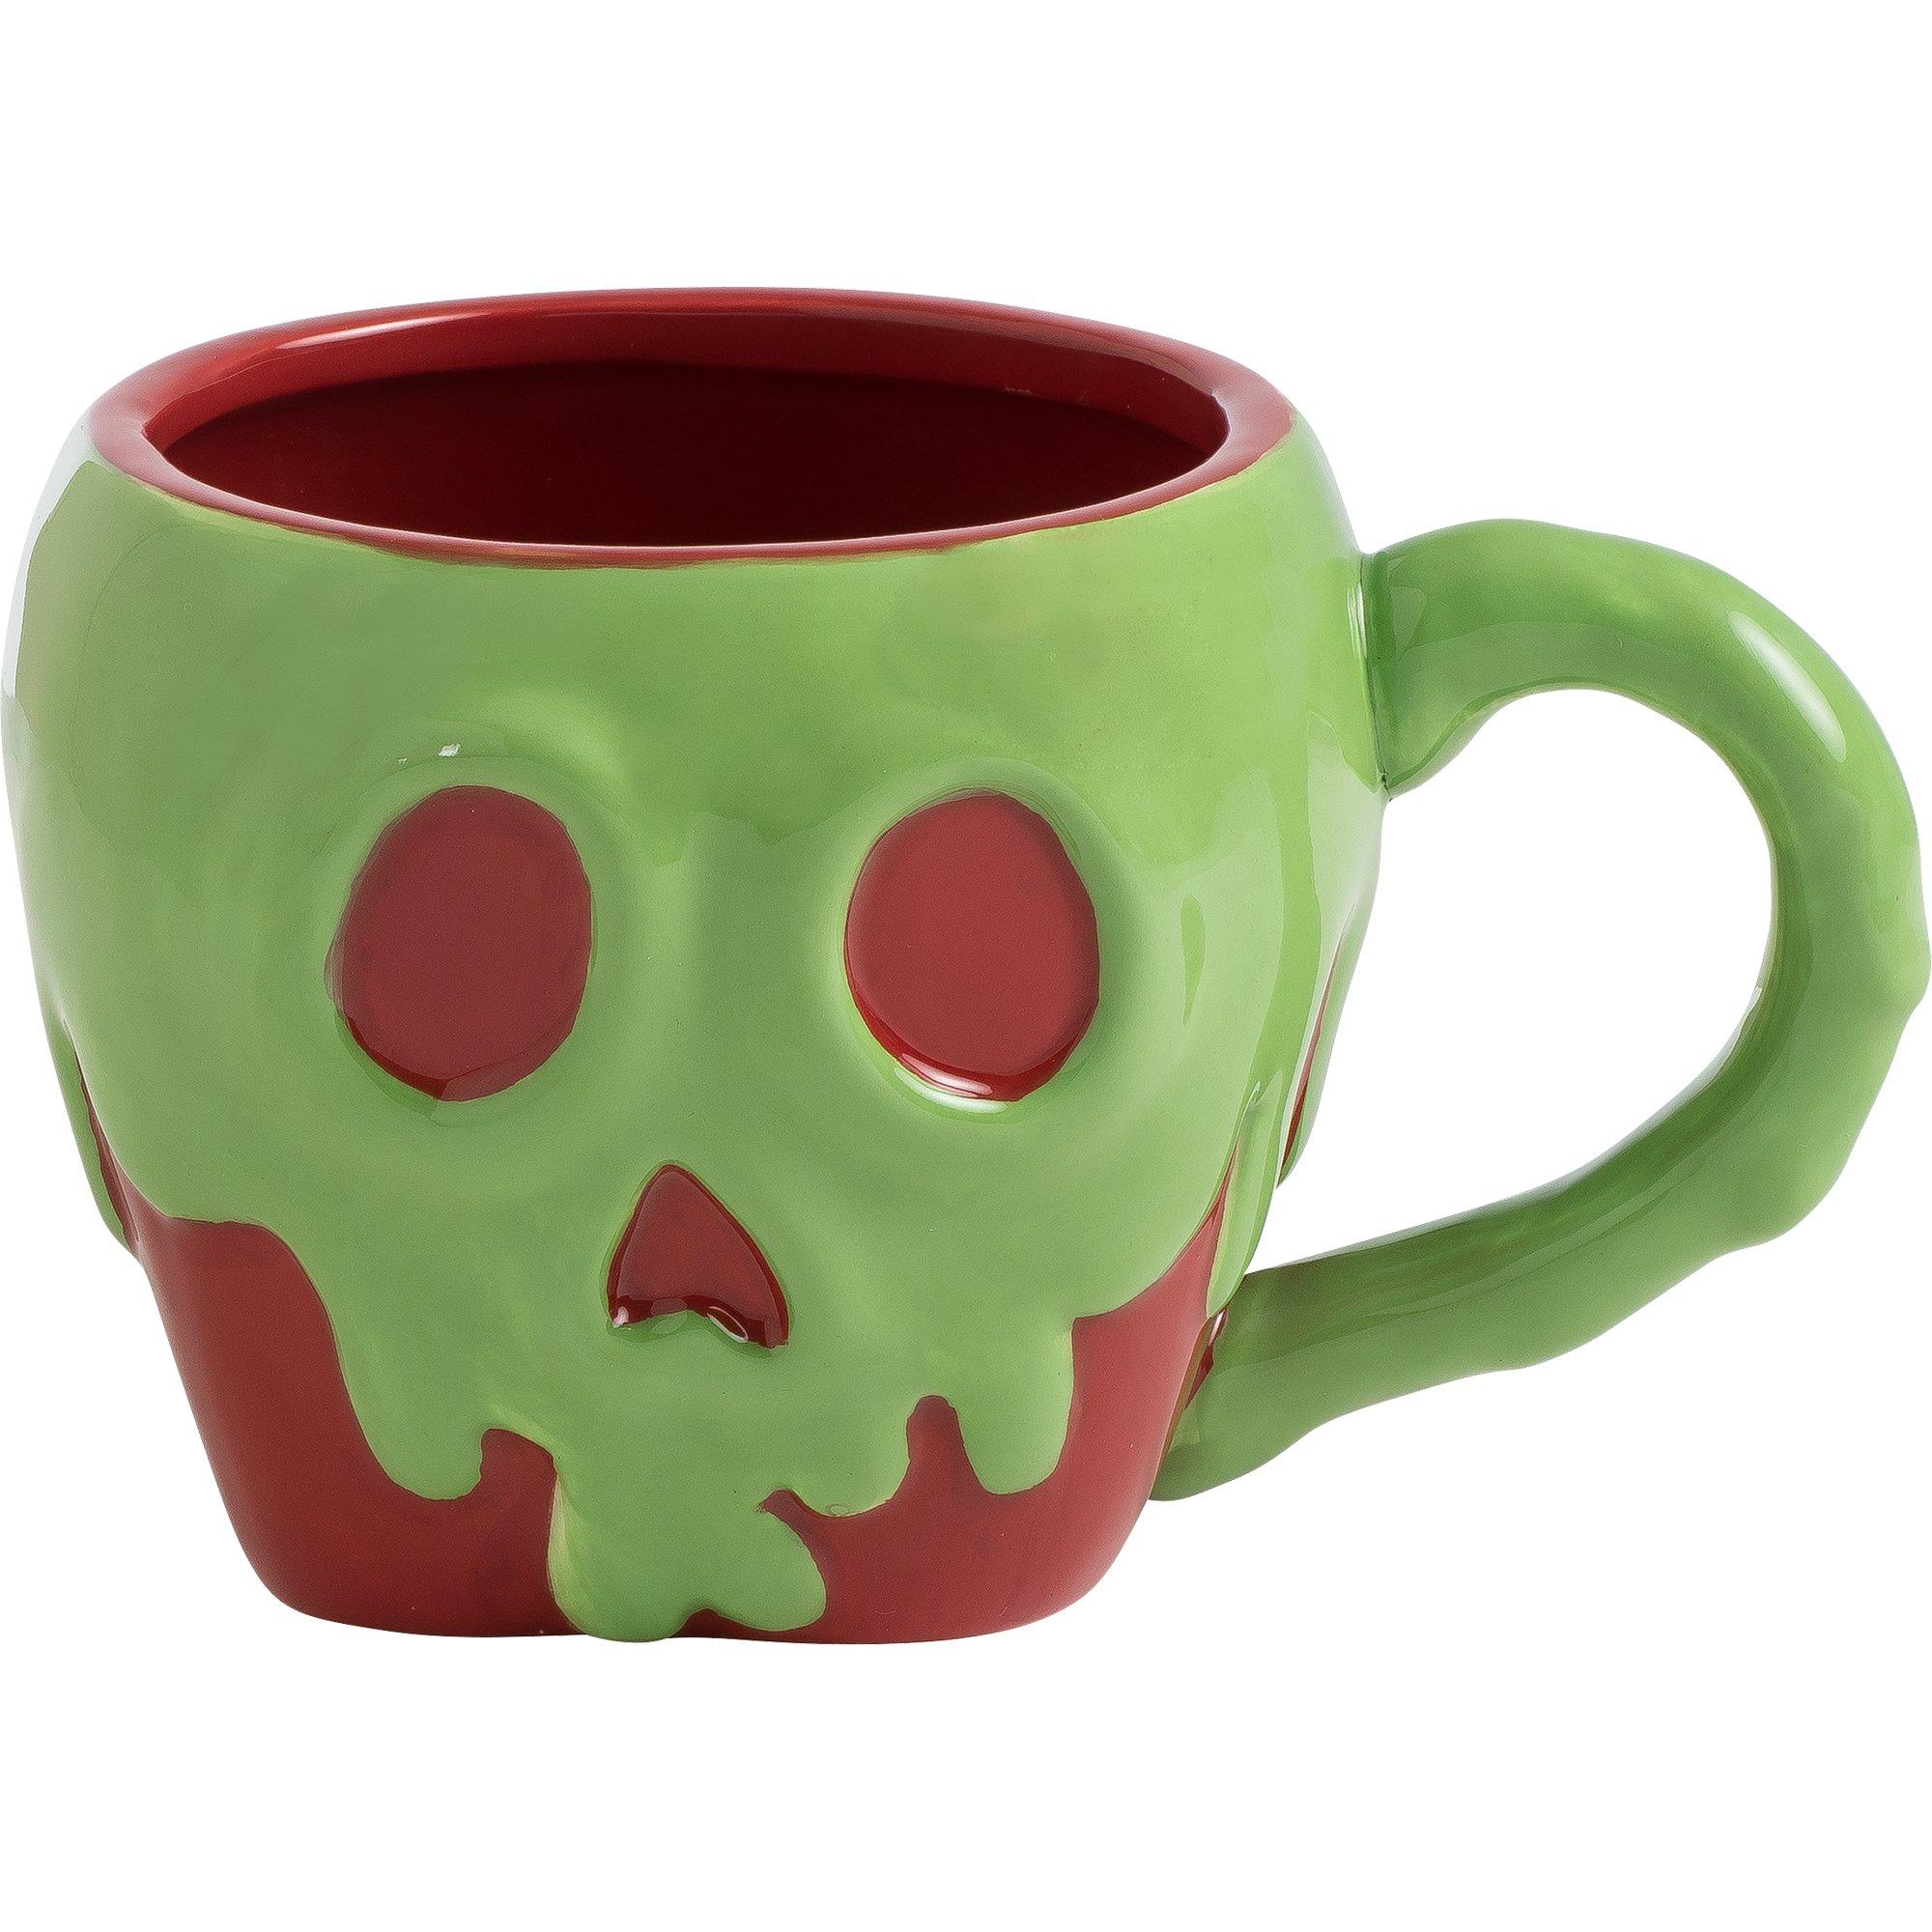 Vandor Disney Snow White Poison Apple Shaped Ceramic Soup Coffee Mug Cup, 4.6 x 6.5 Inch